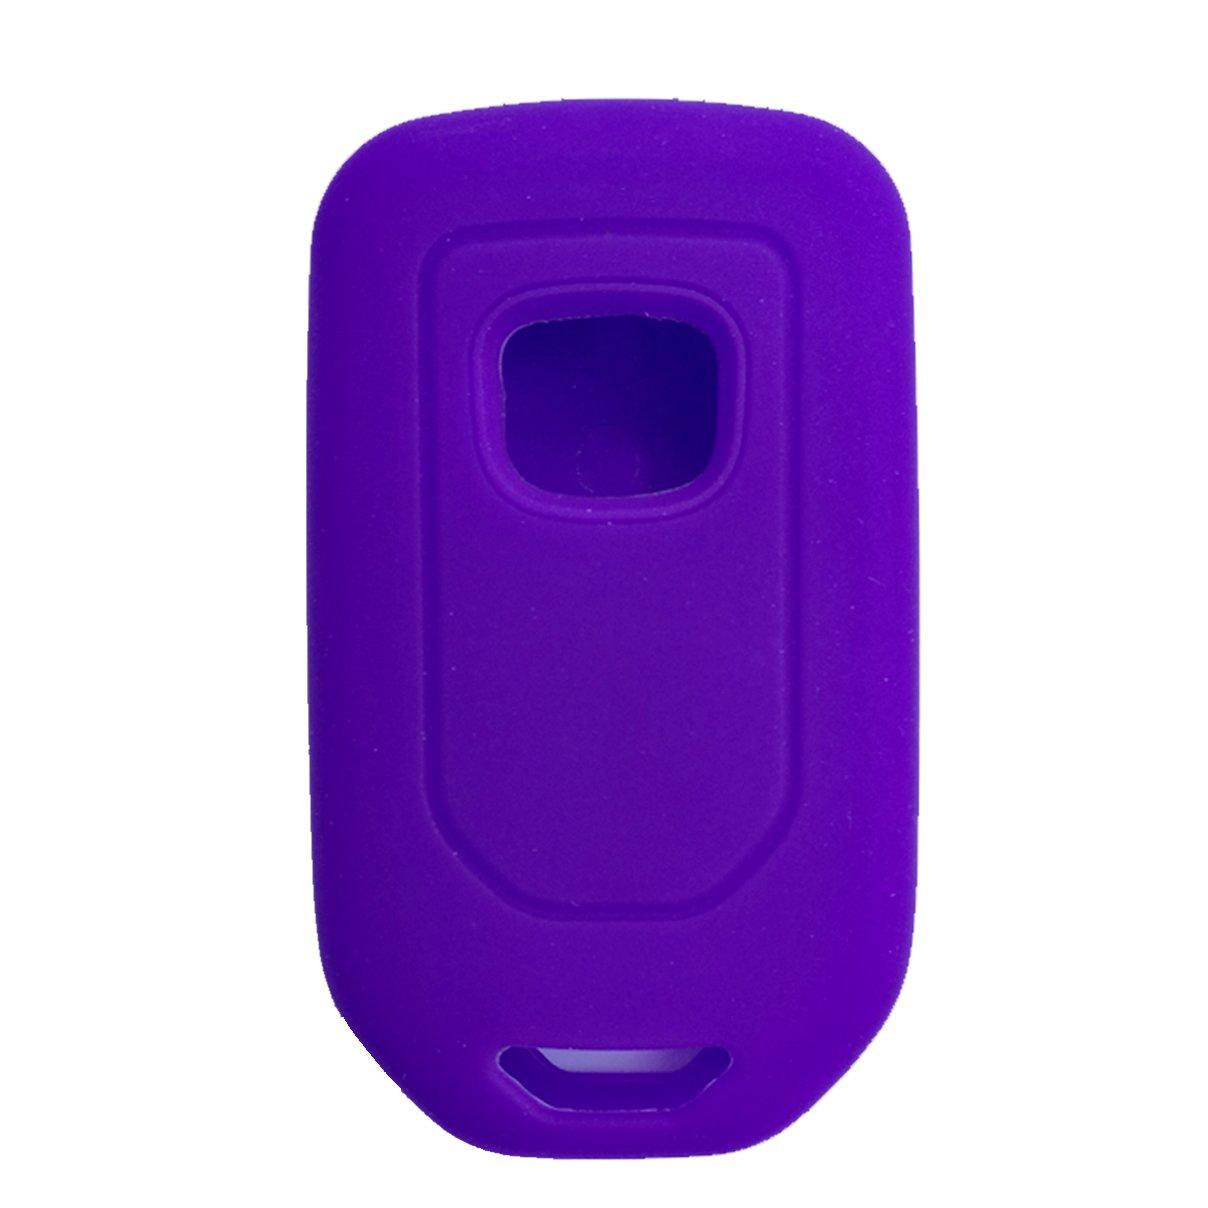 2 Silicone Black Rose Car key Fob Case Cover Holder Skin Protector for 2019 2018 2017 2016 2015 Honda Accord Civic CR-V CRV Pilot EX EX-L Touring Premium 5 Buttons Smart key A2C81642600 Alegender Qty